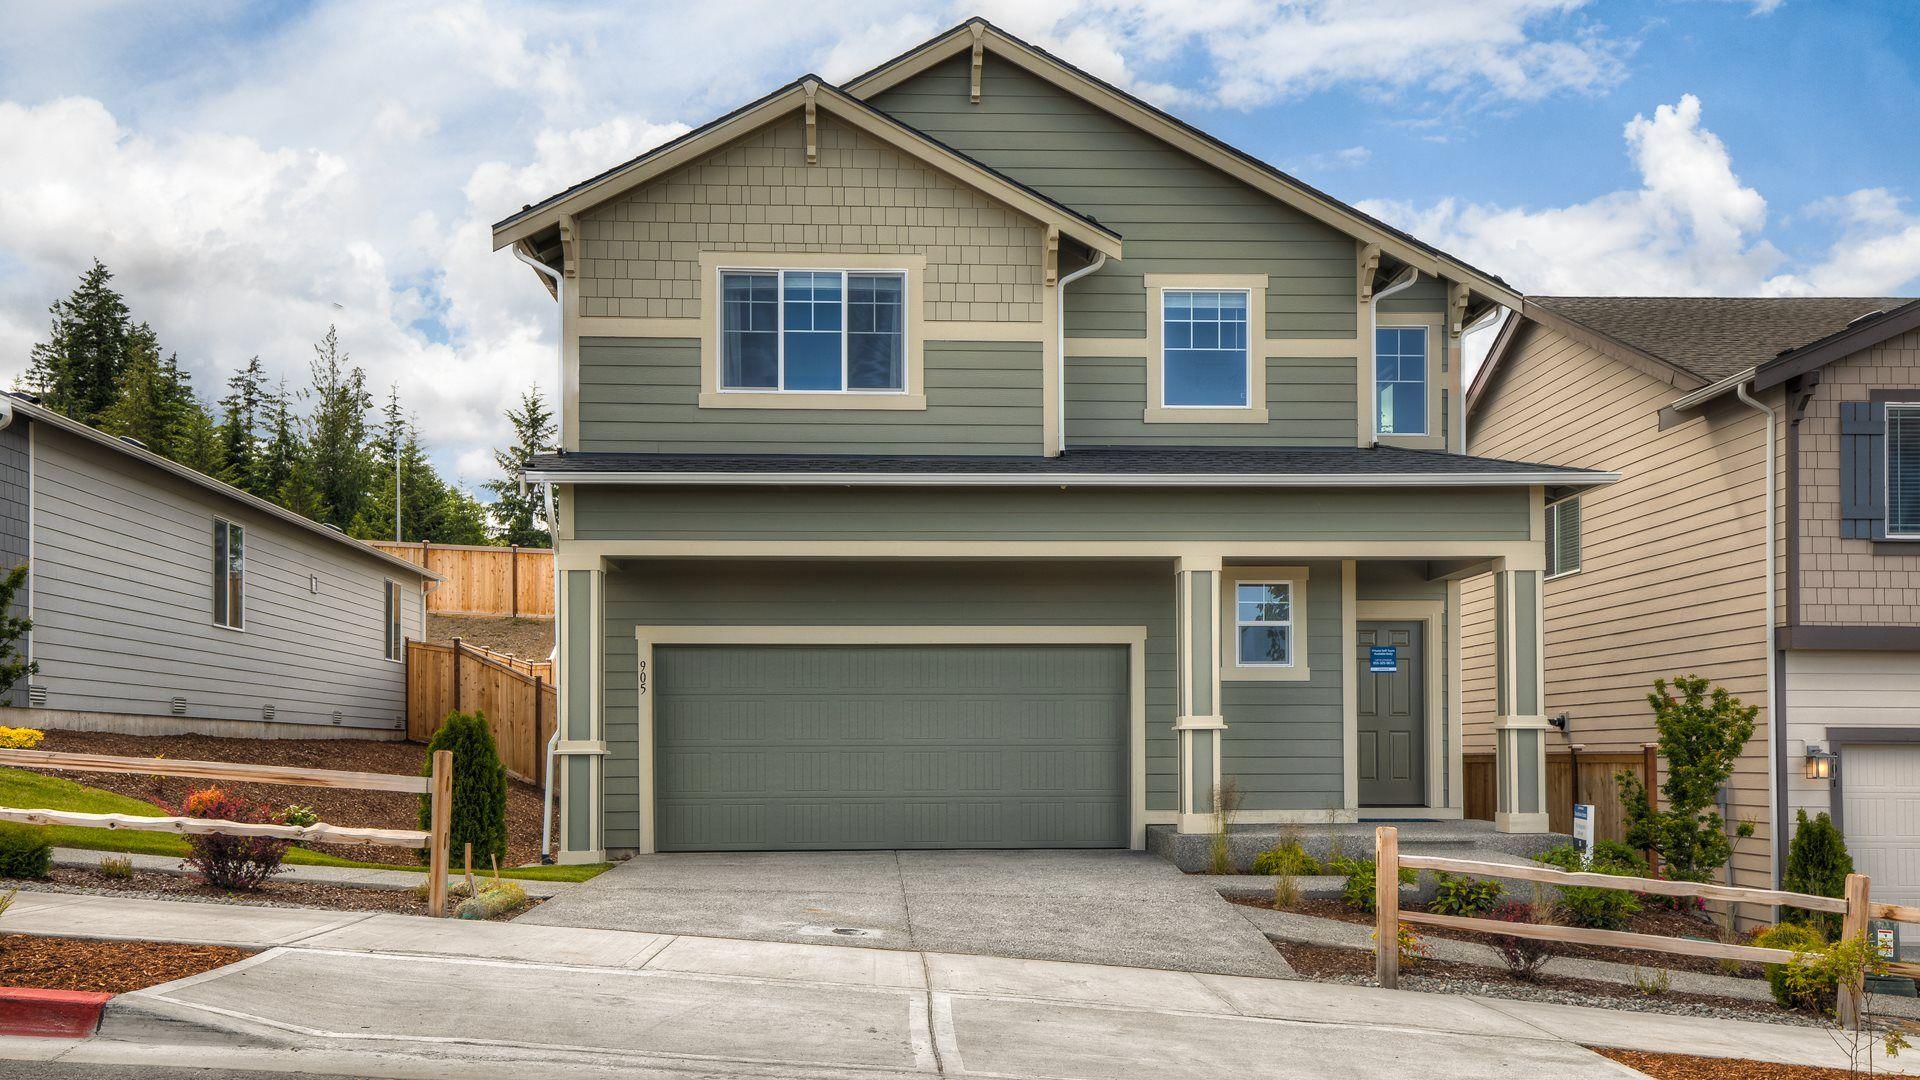 The Magnolia Model home at Soundview Estates